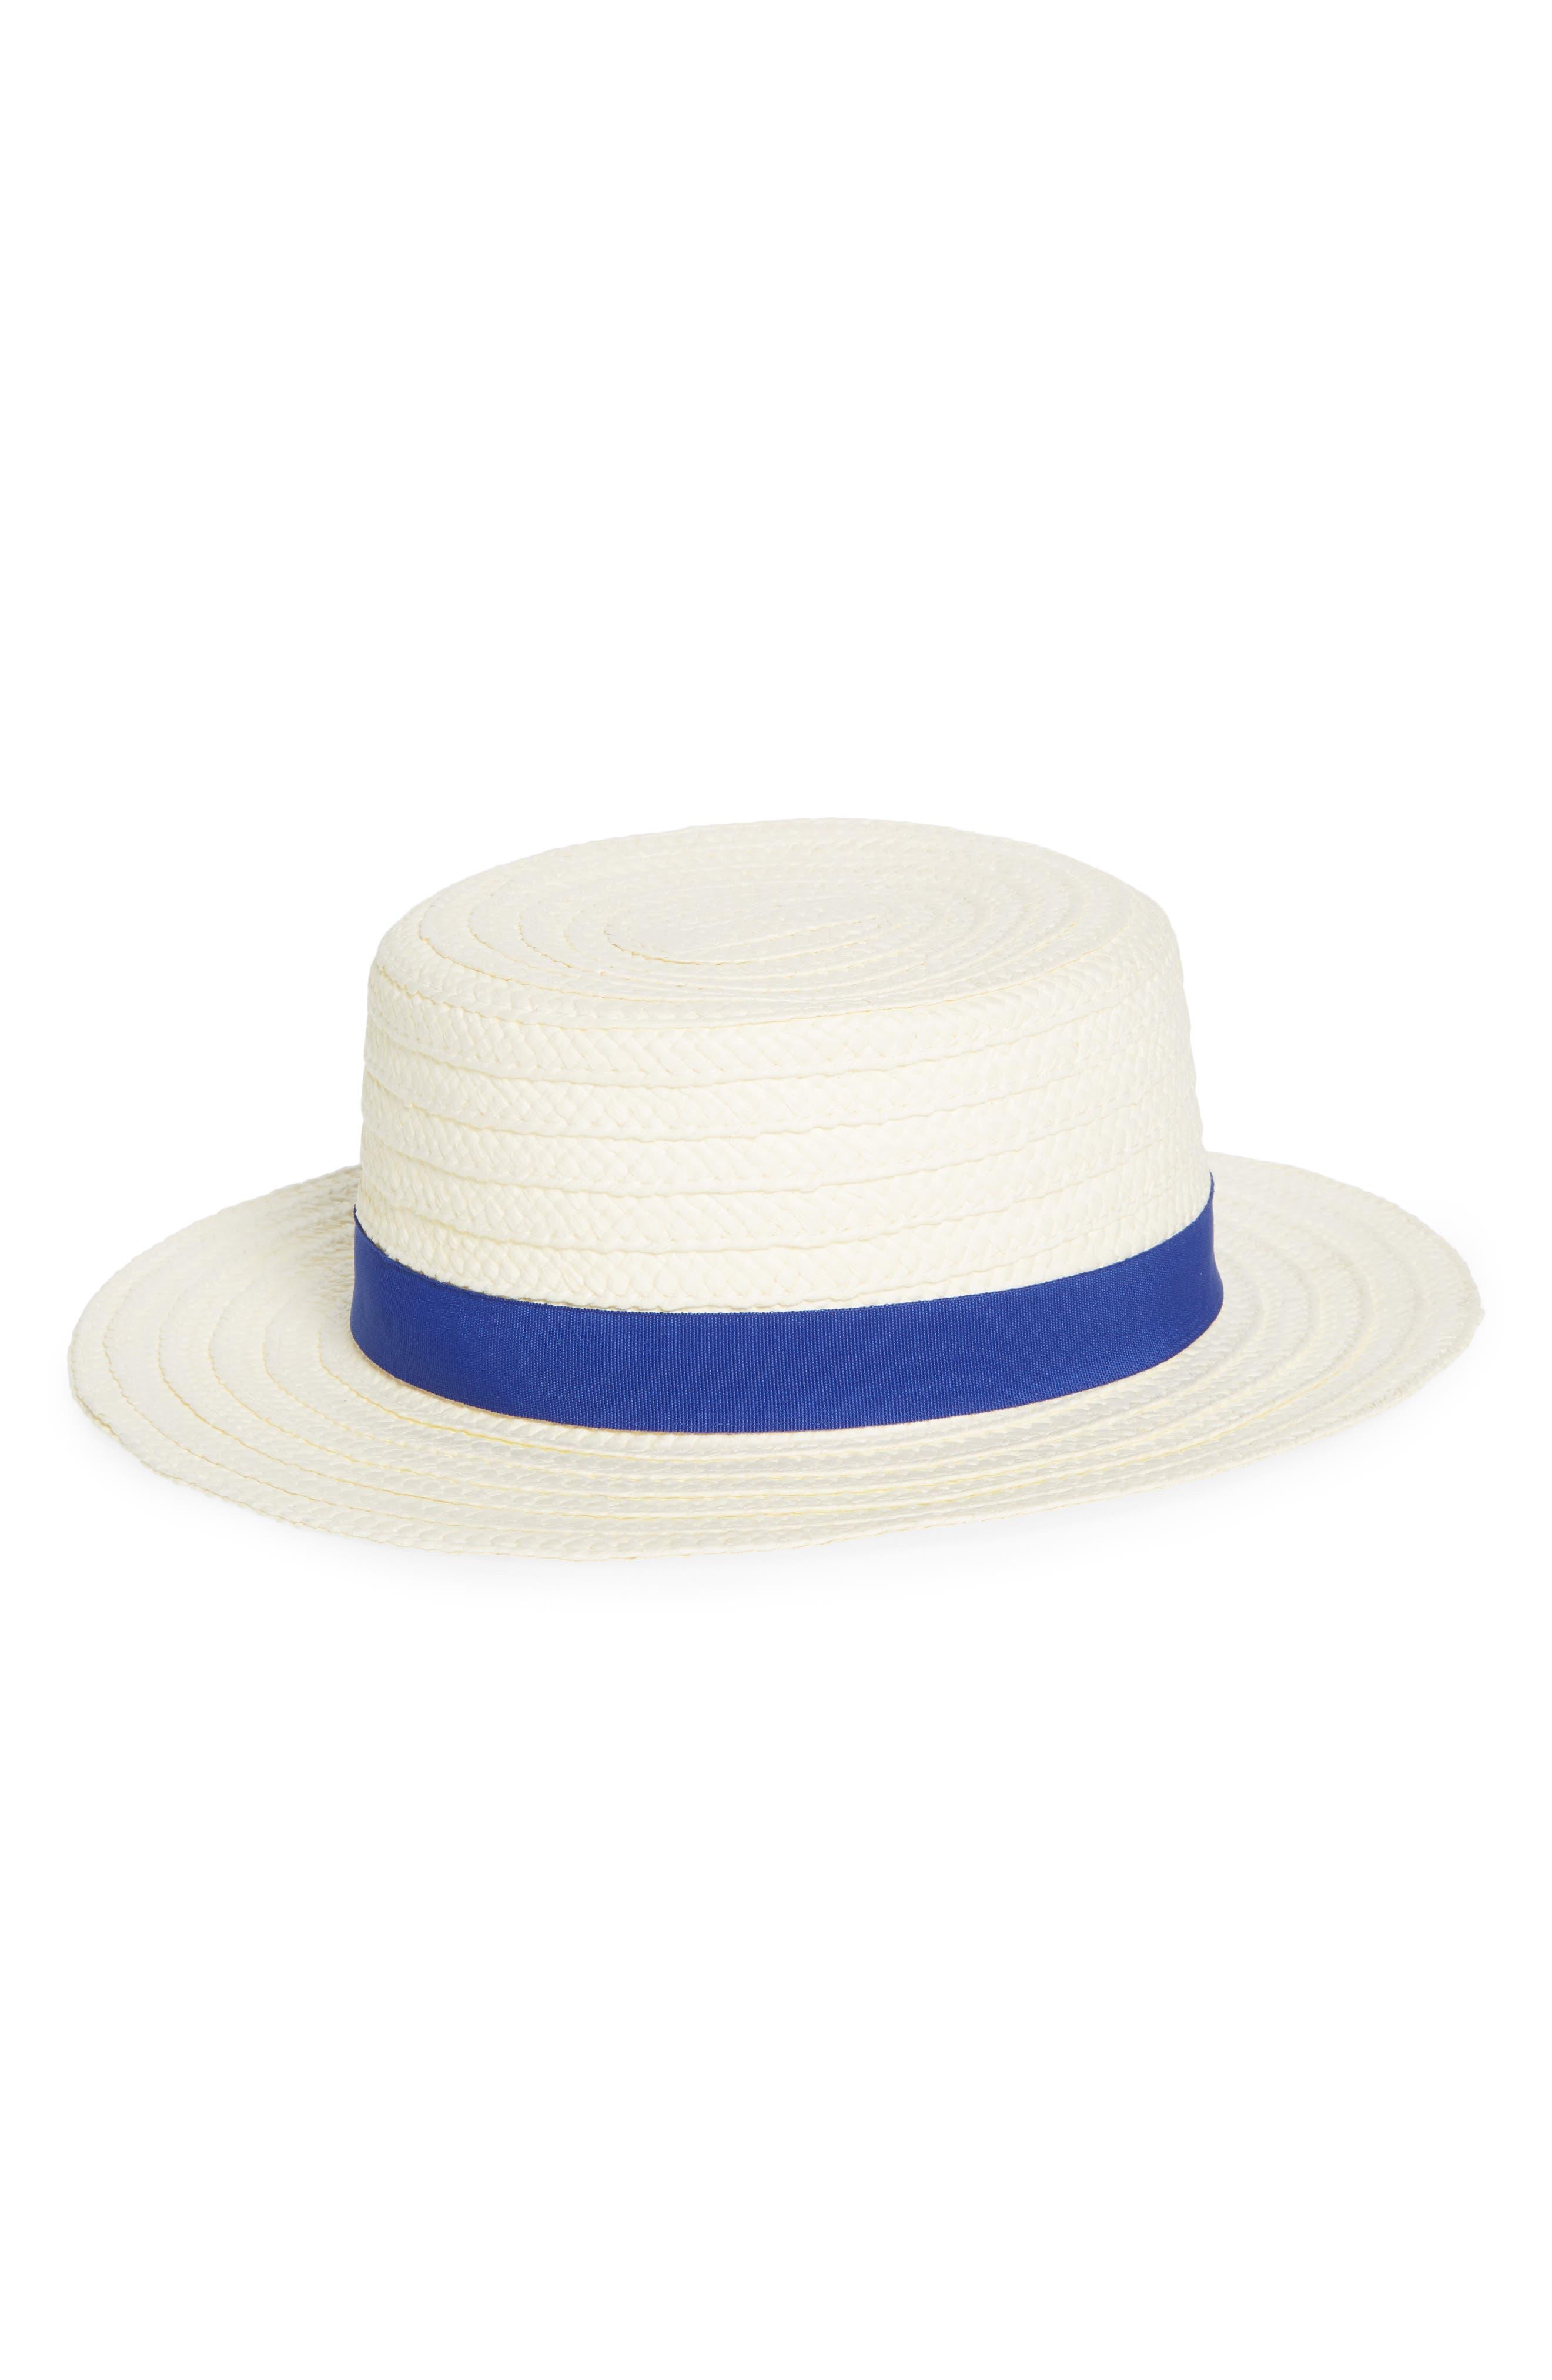 TREASURE & BOND, Straw Boater Hat, Main thumbnail 1, color, 100